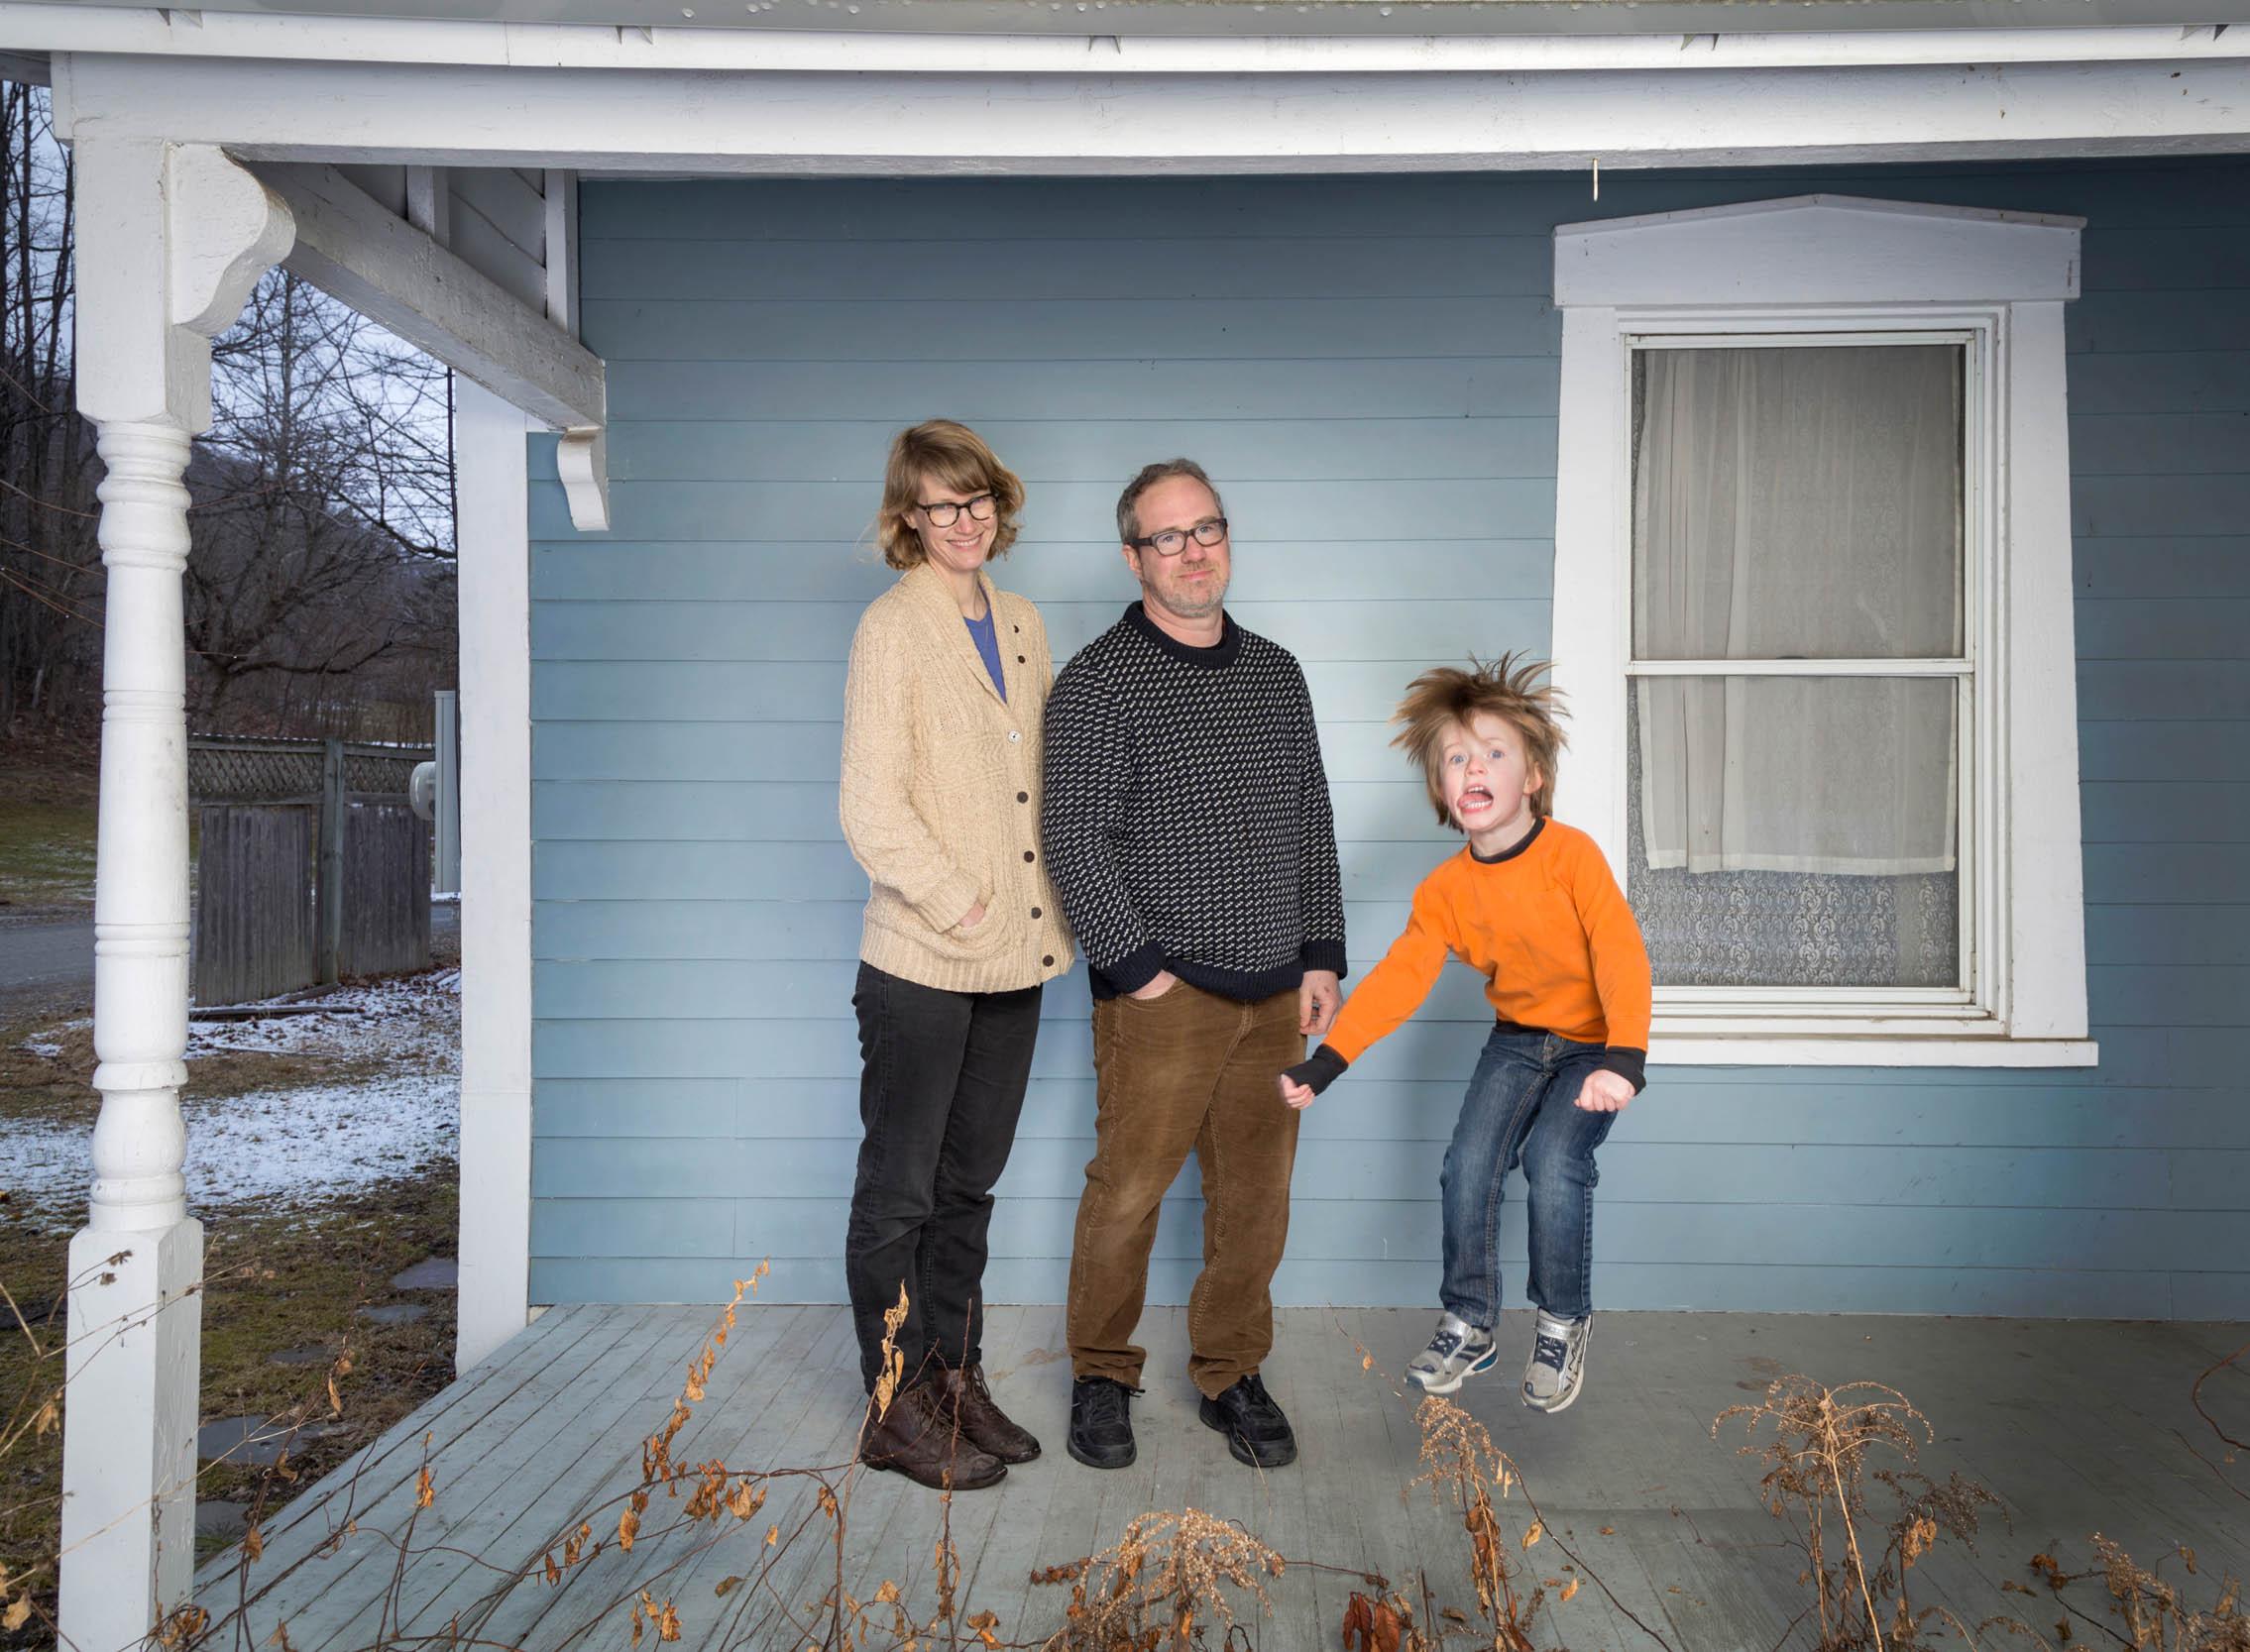 KARA HEARN AND BILL MILLER - Family Residents